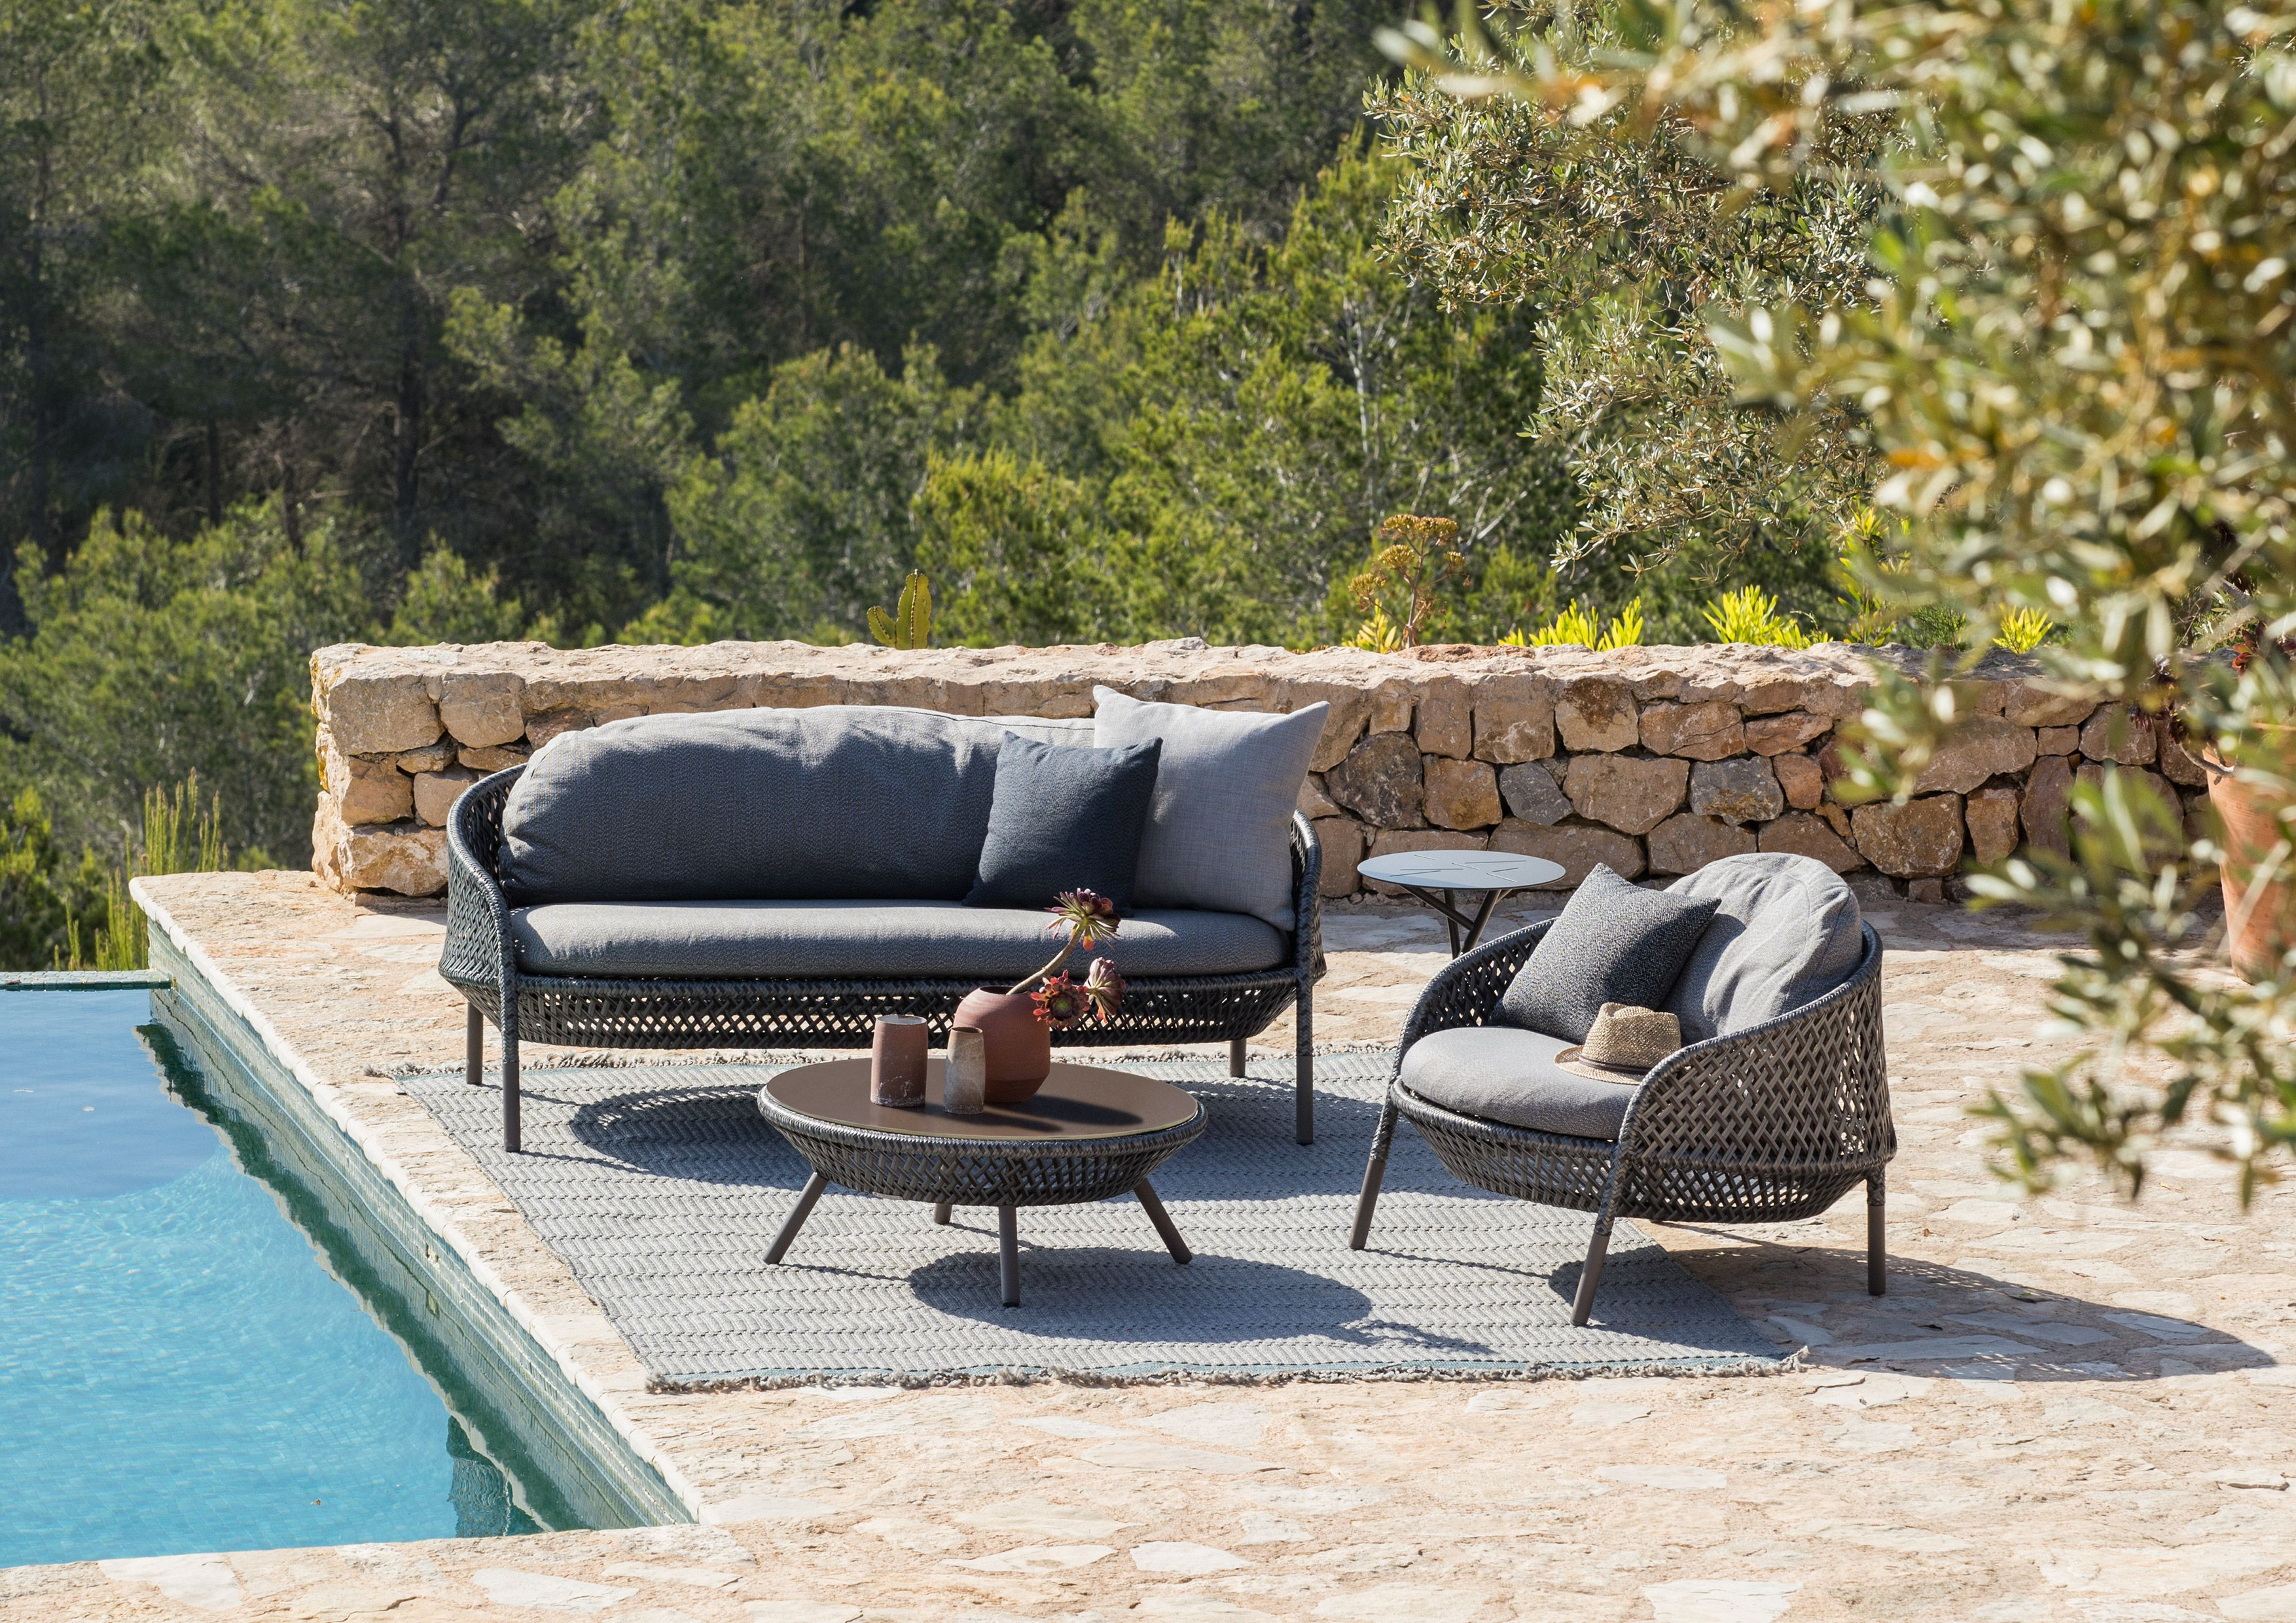 Dedon Ahnda H H Dubai In 2019 Outdoor Furniture Sofa